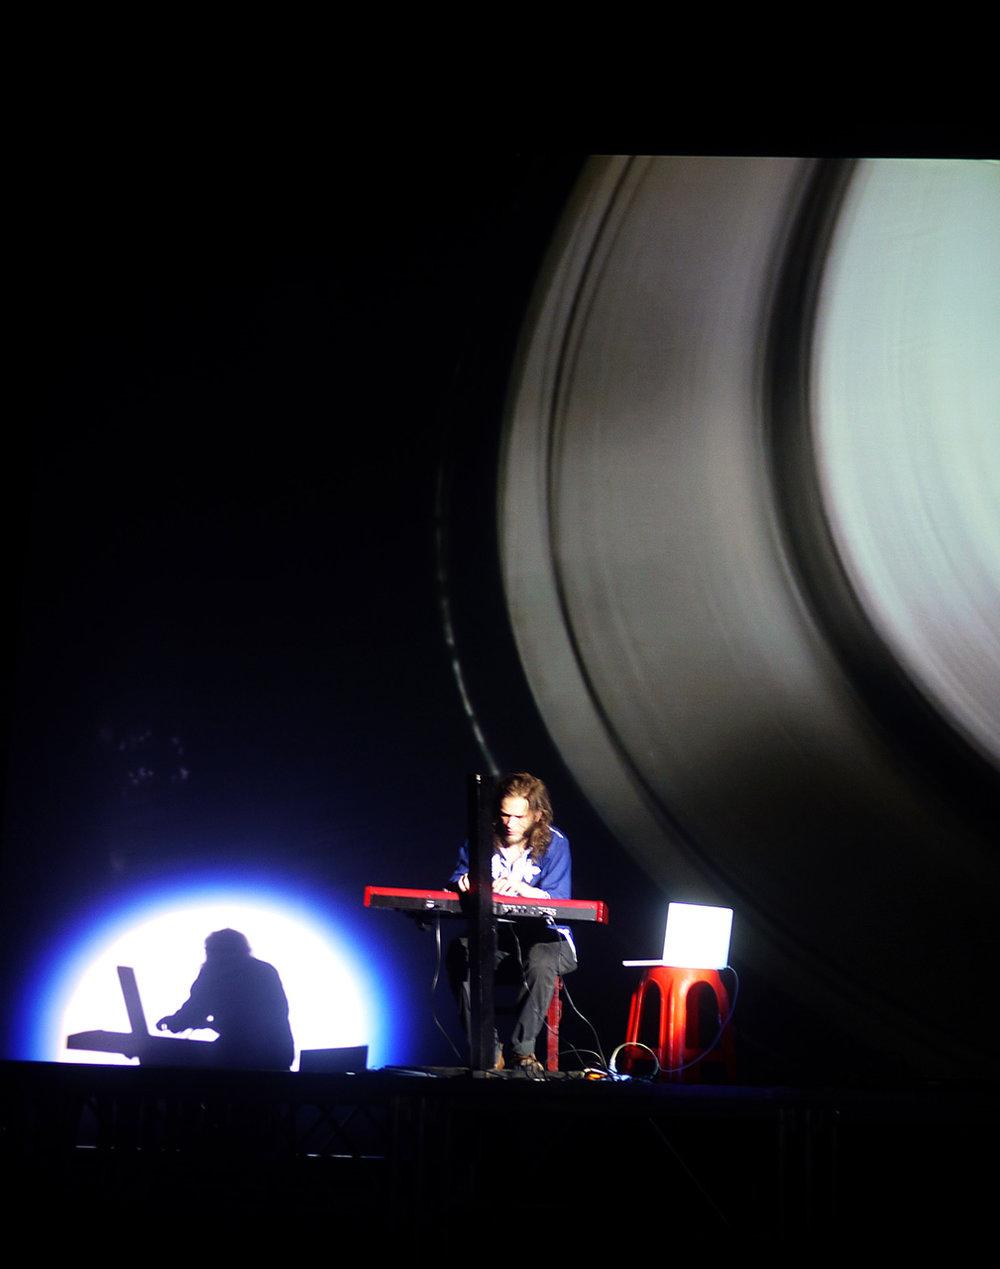 Concert with Eric,Matthieu 03-1280.jpg